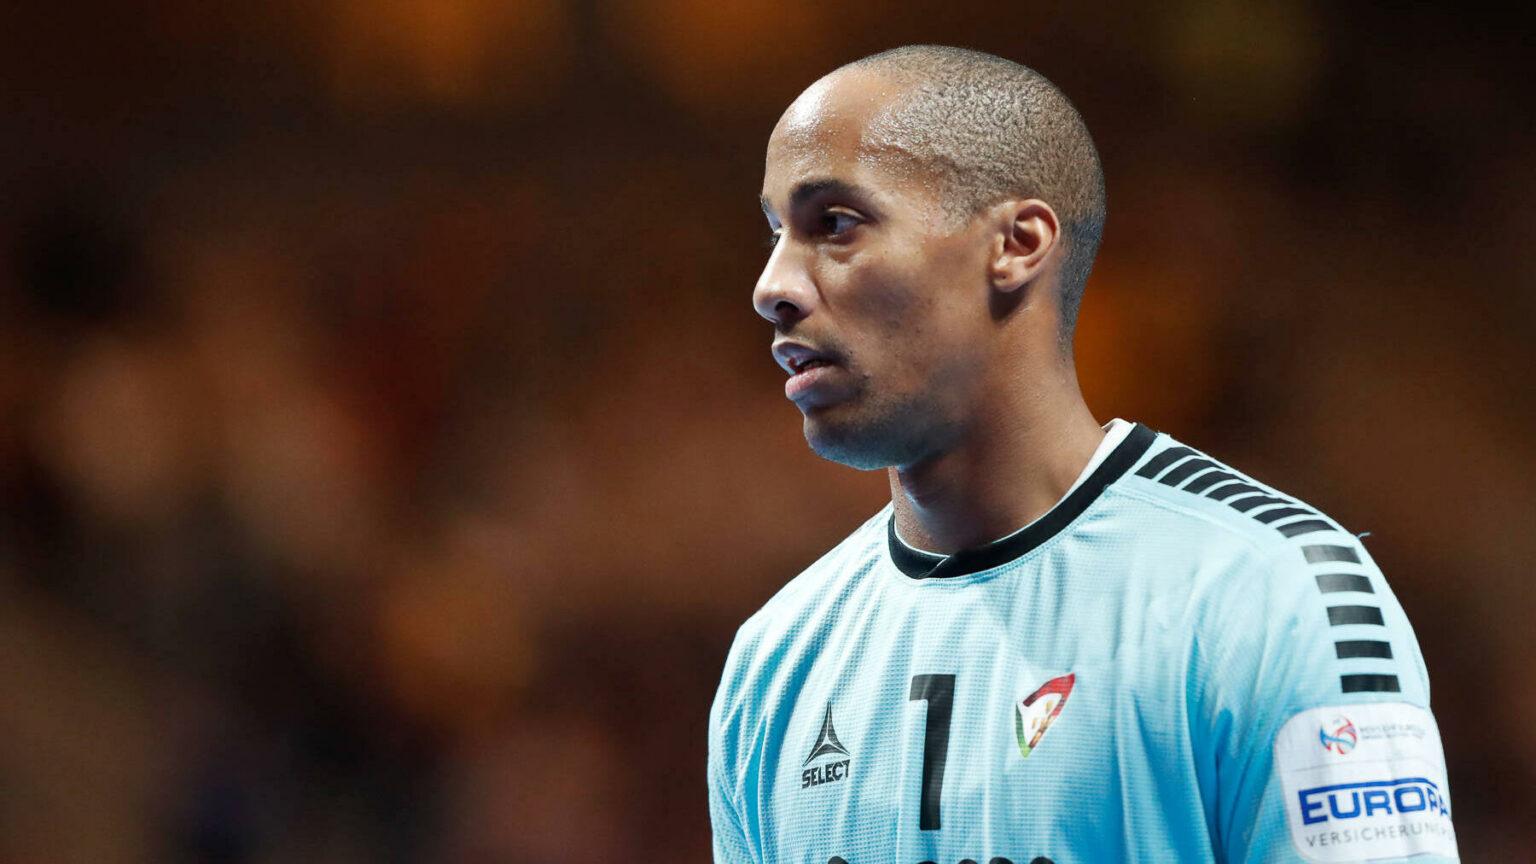 Olympia Handball Deutschland 2021